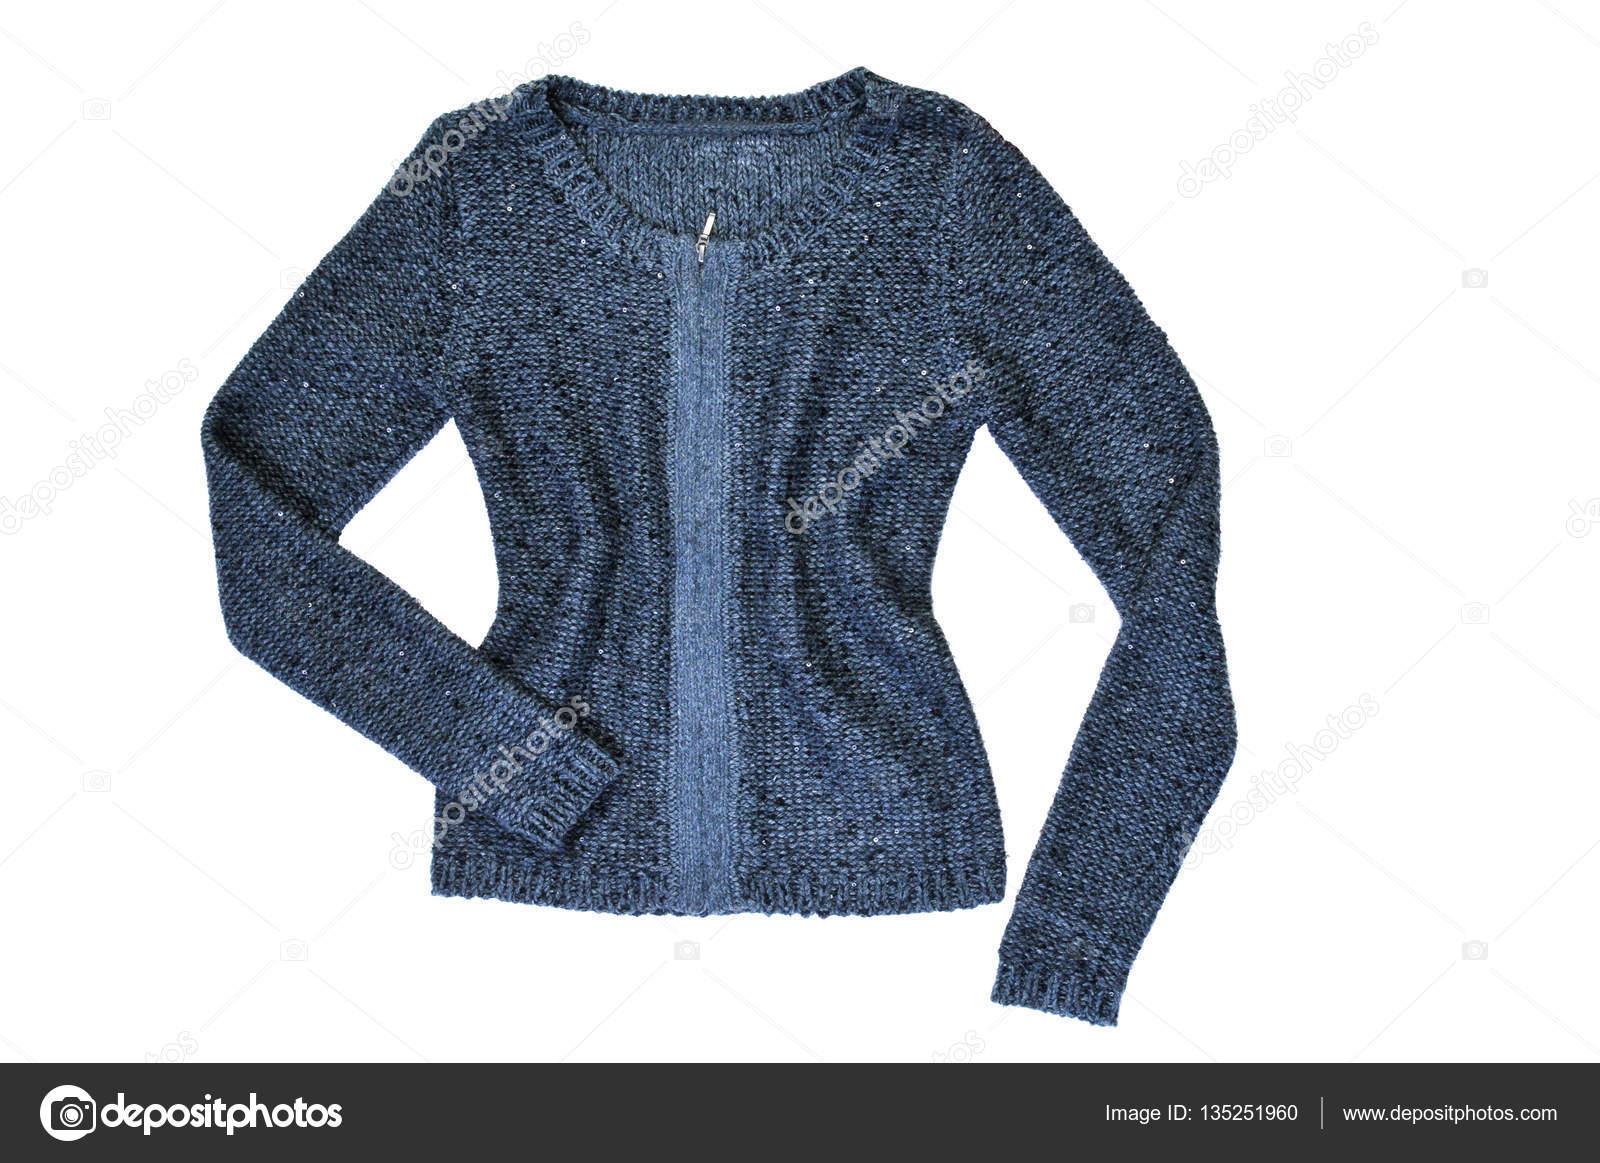 12e26a5c114 Γυναικείο πλεκτό μάλλινο πουλόβερ — Φωτογραφία Αρχείου © joaninha777 ...